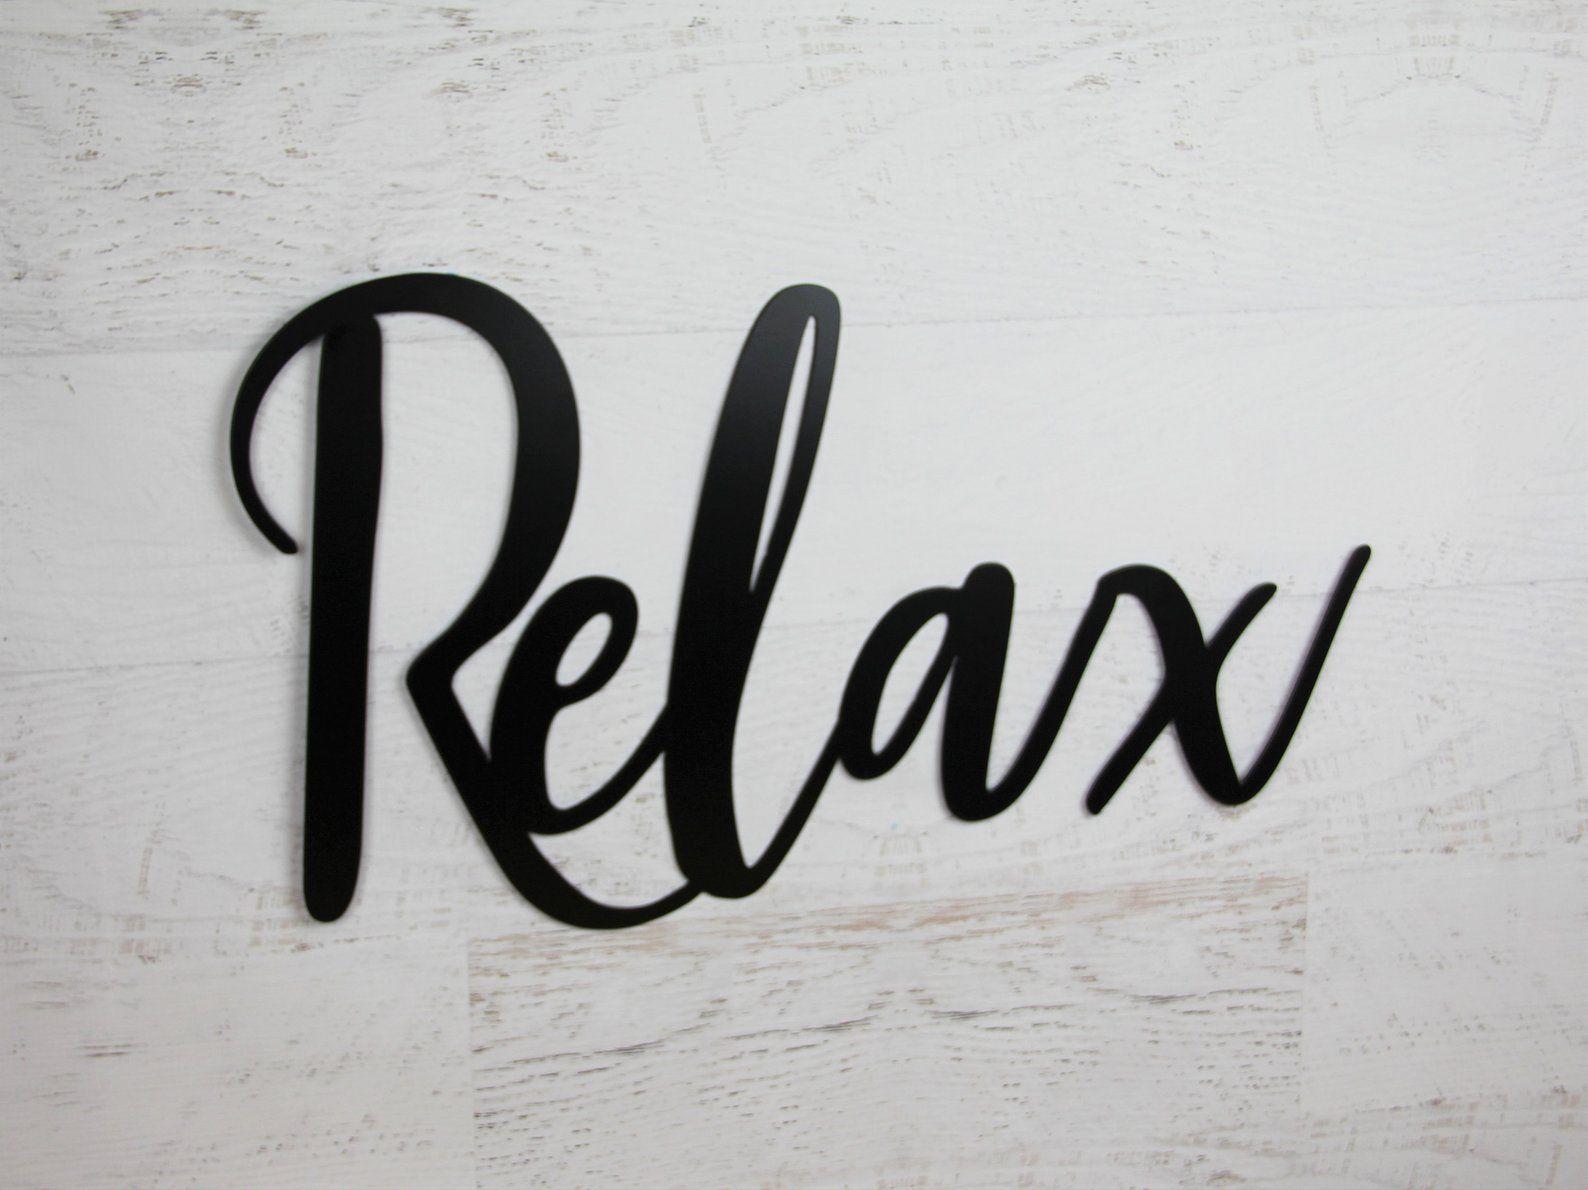 Relax Metal Word Art Decor Relax Cursive Wall Hanging Relax Etsy In 2020 Word Wall Art Metal Wall Words Metal Wall Art Decor